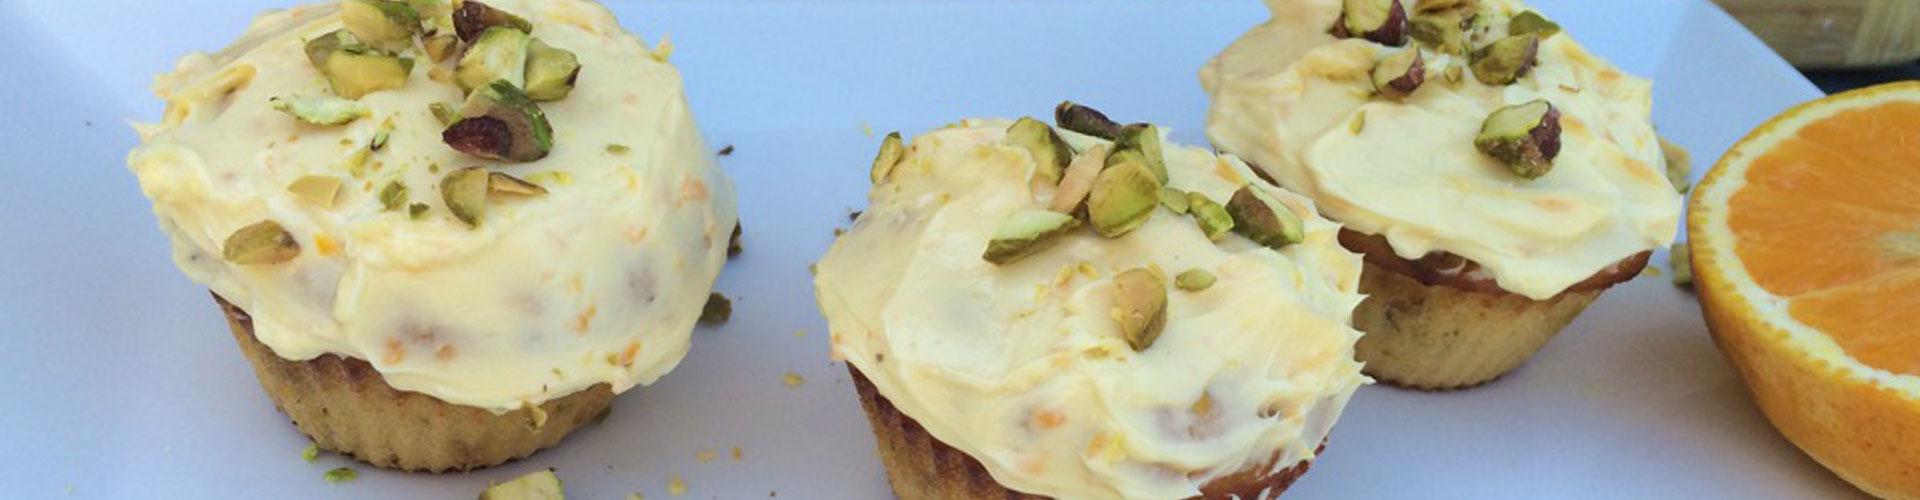 04-Orange-Pistachio-Cupcakes-(grain-free-dairy-free)